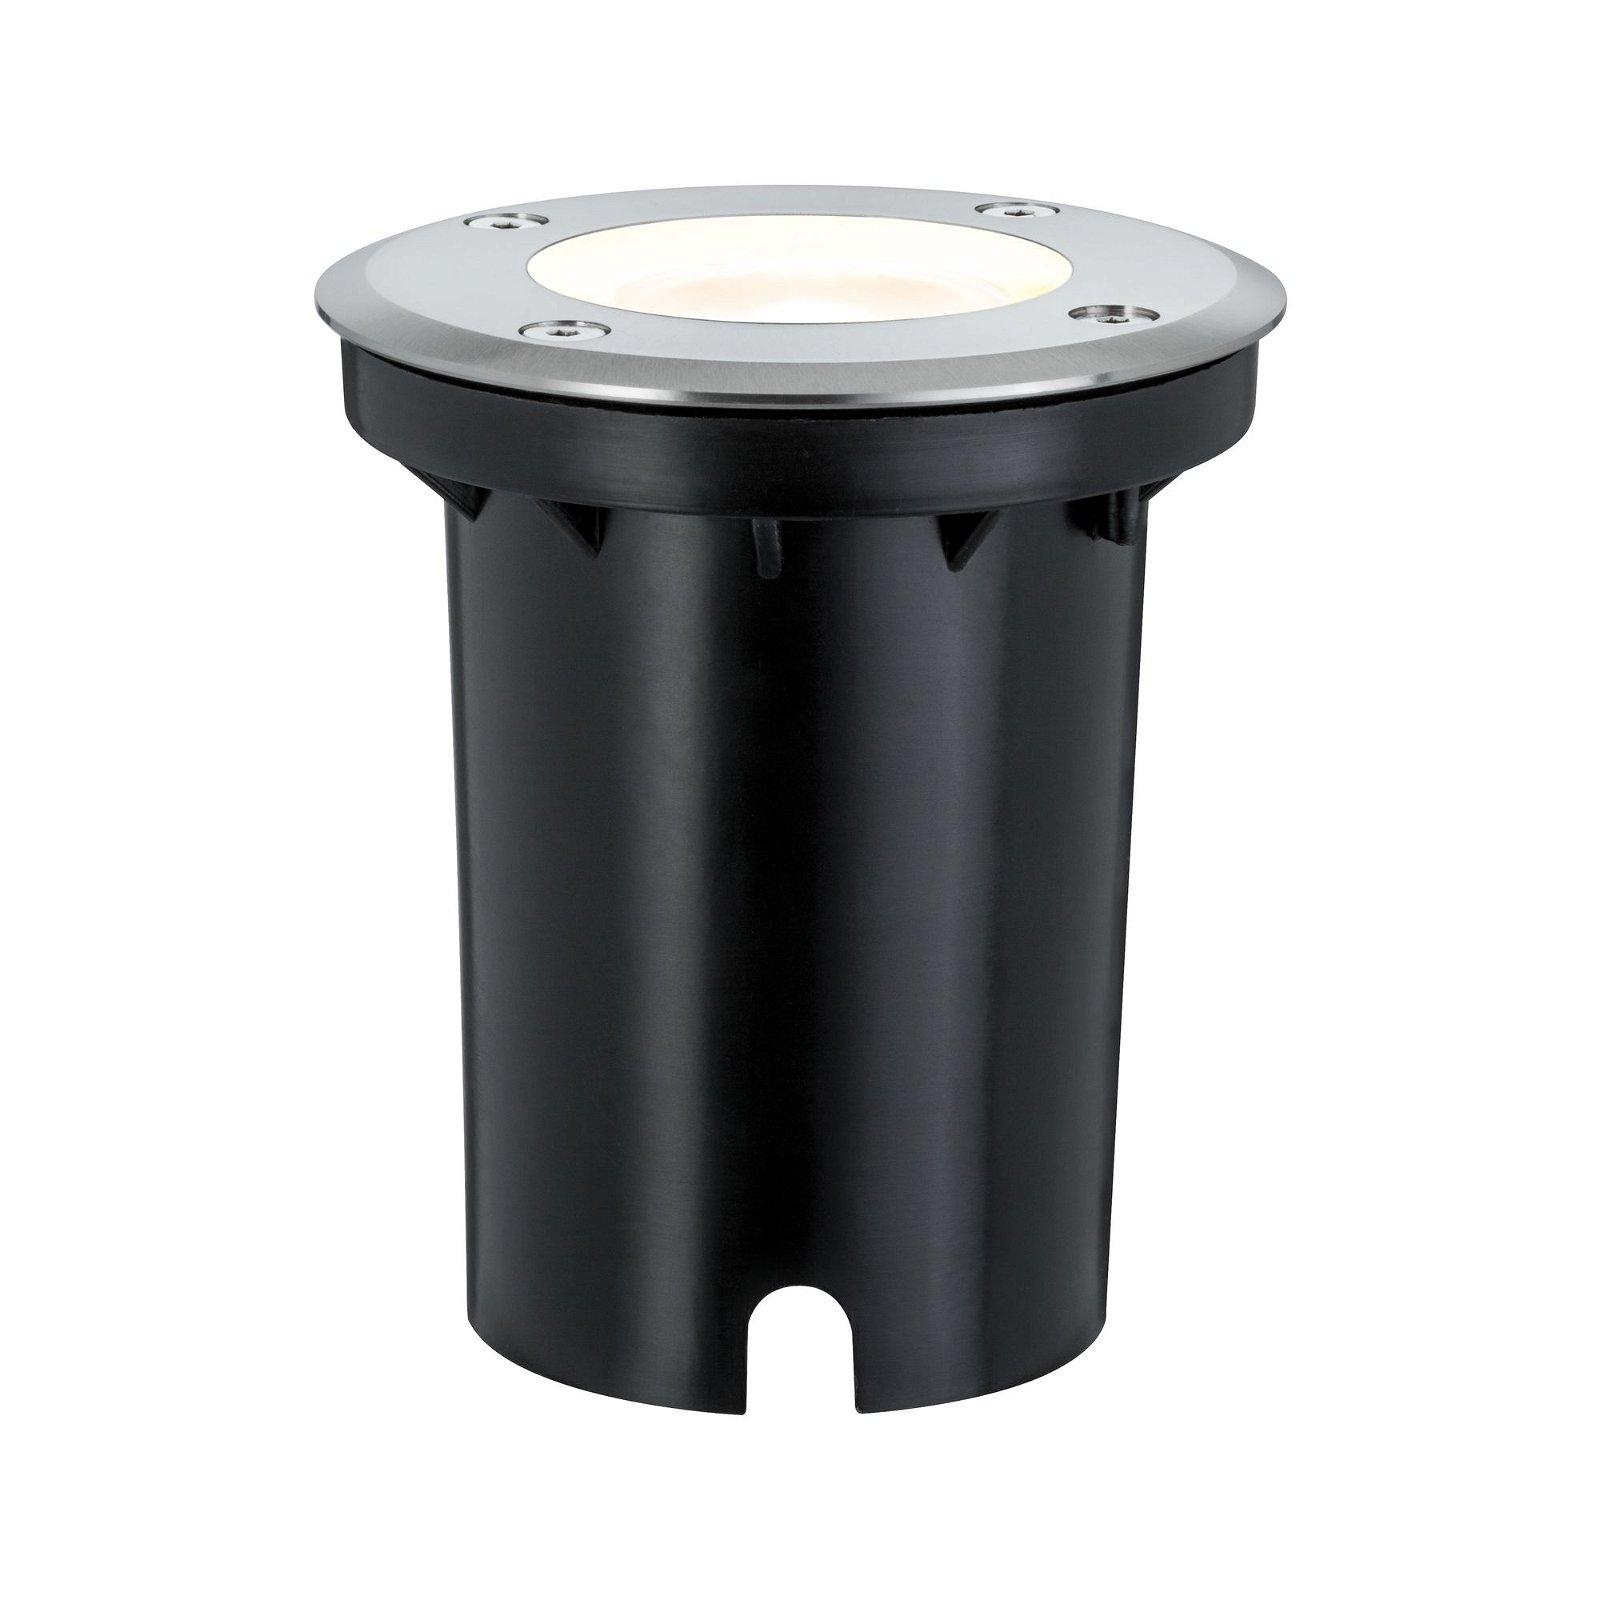 Special Line LED-grondinbouwlamp IP67 rond 108mm 3,5W 230V Edelstaal Metaal